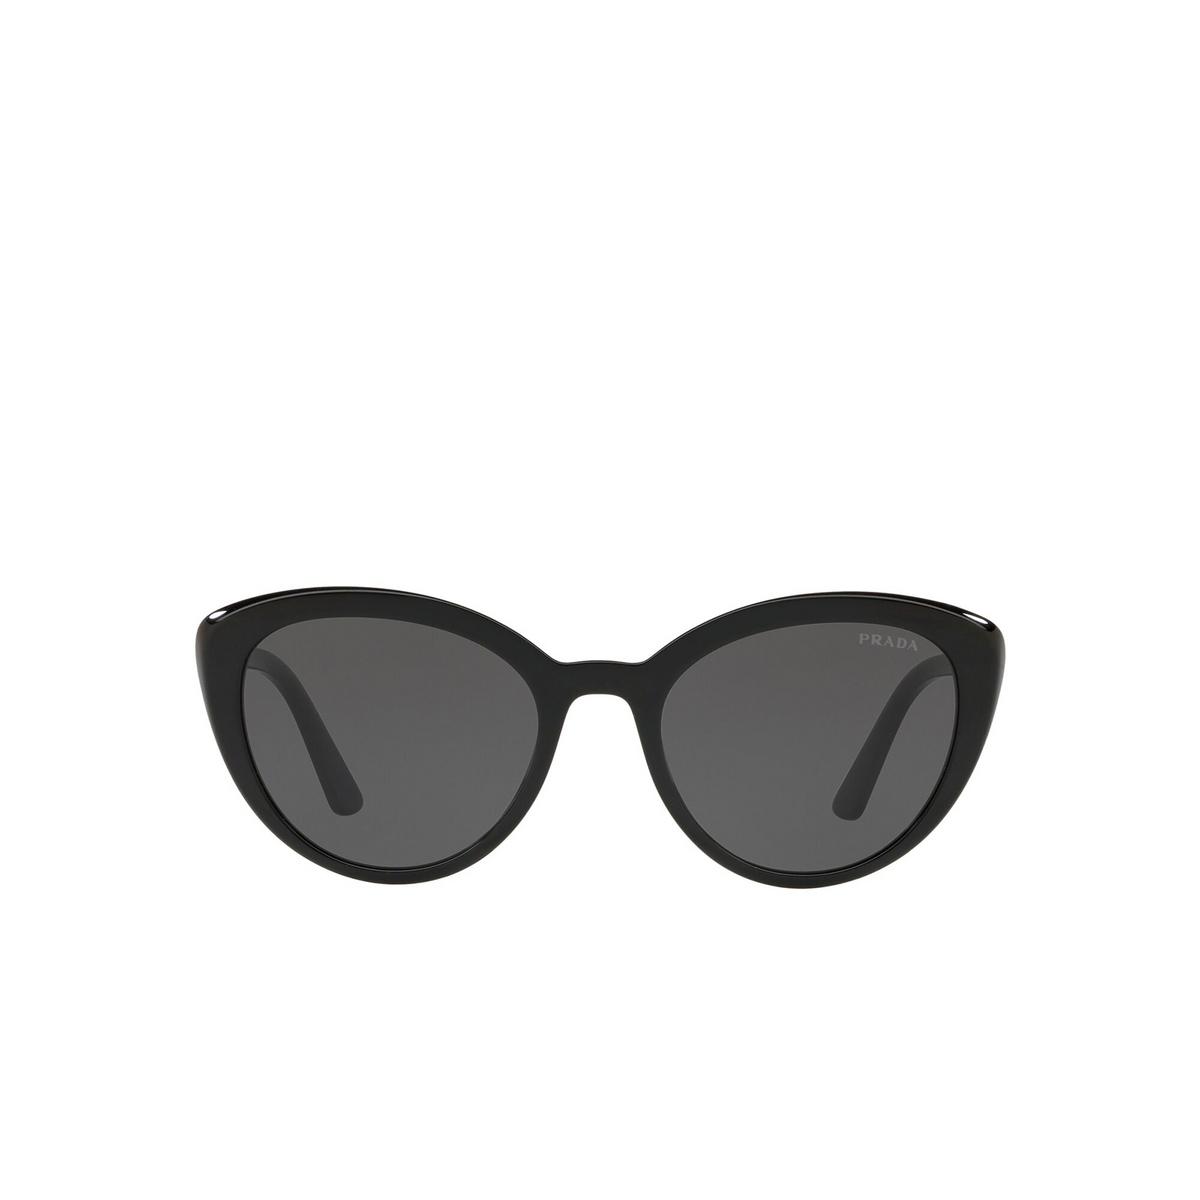 Prada® Cat-eye Sunglasses: PR 02VS color Black 1AB5S0 - front view.